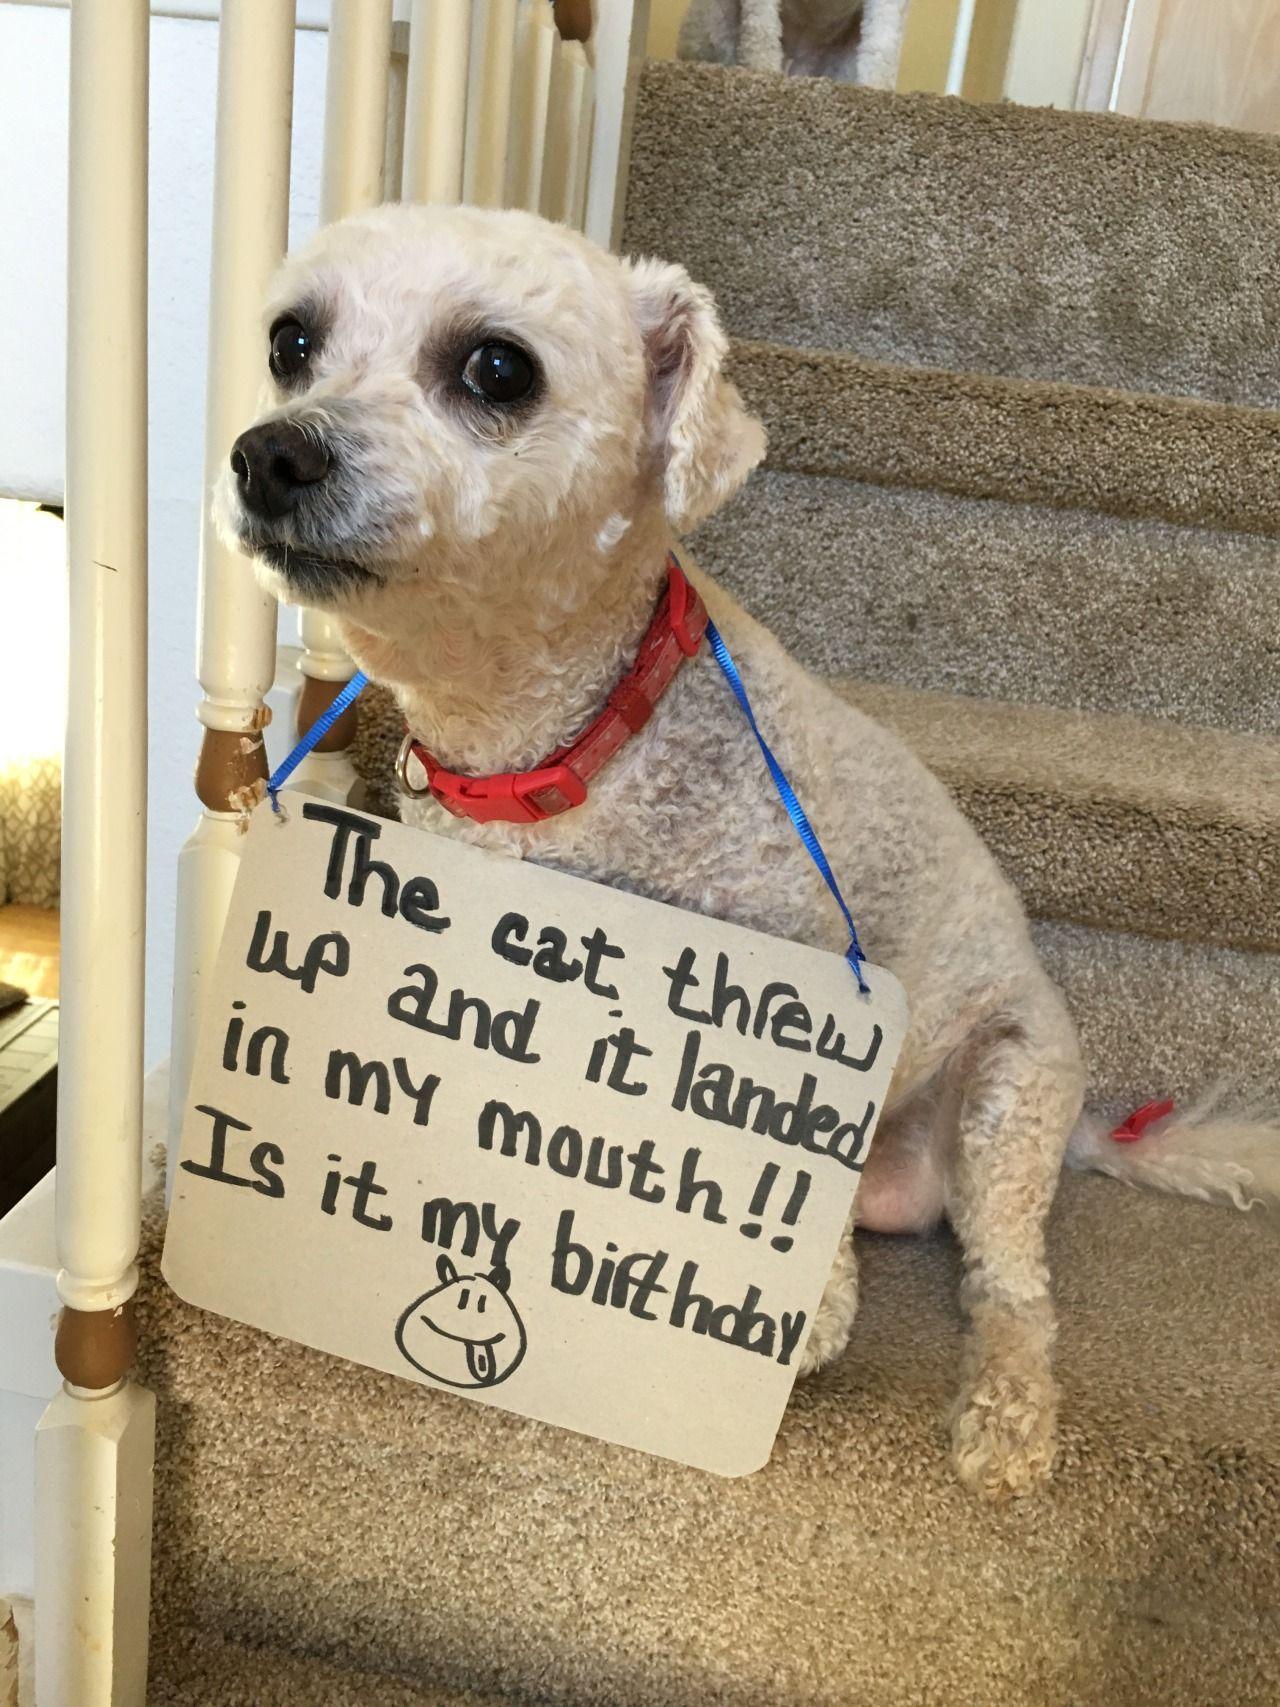 Dog Throwing Up Meme : throwing, Threw, Landed, Mouth!!, Birthday?, Shaming,, Shaming, Funny,, Throwing